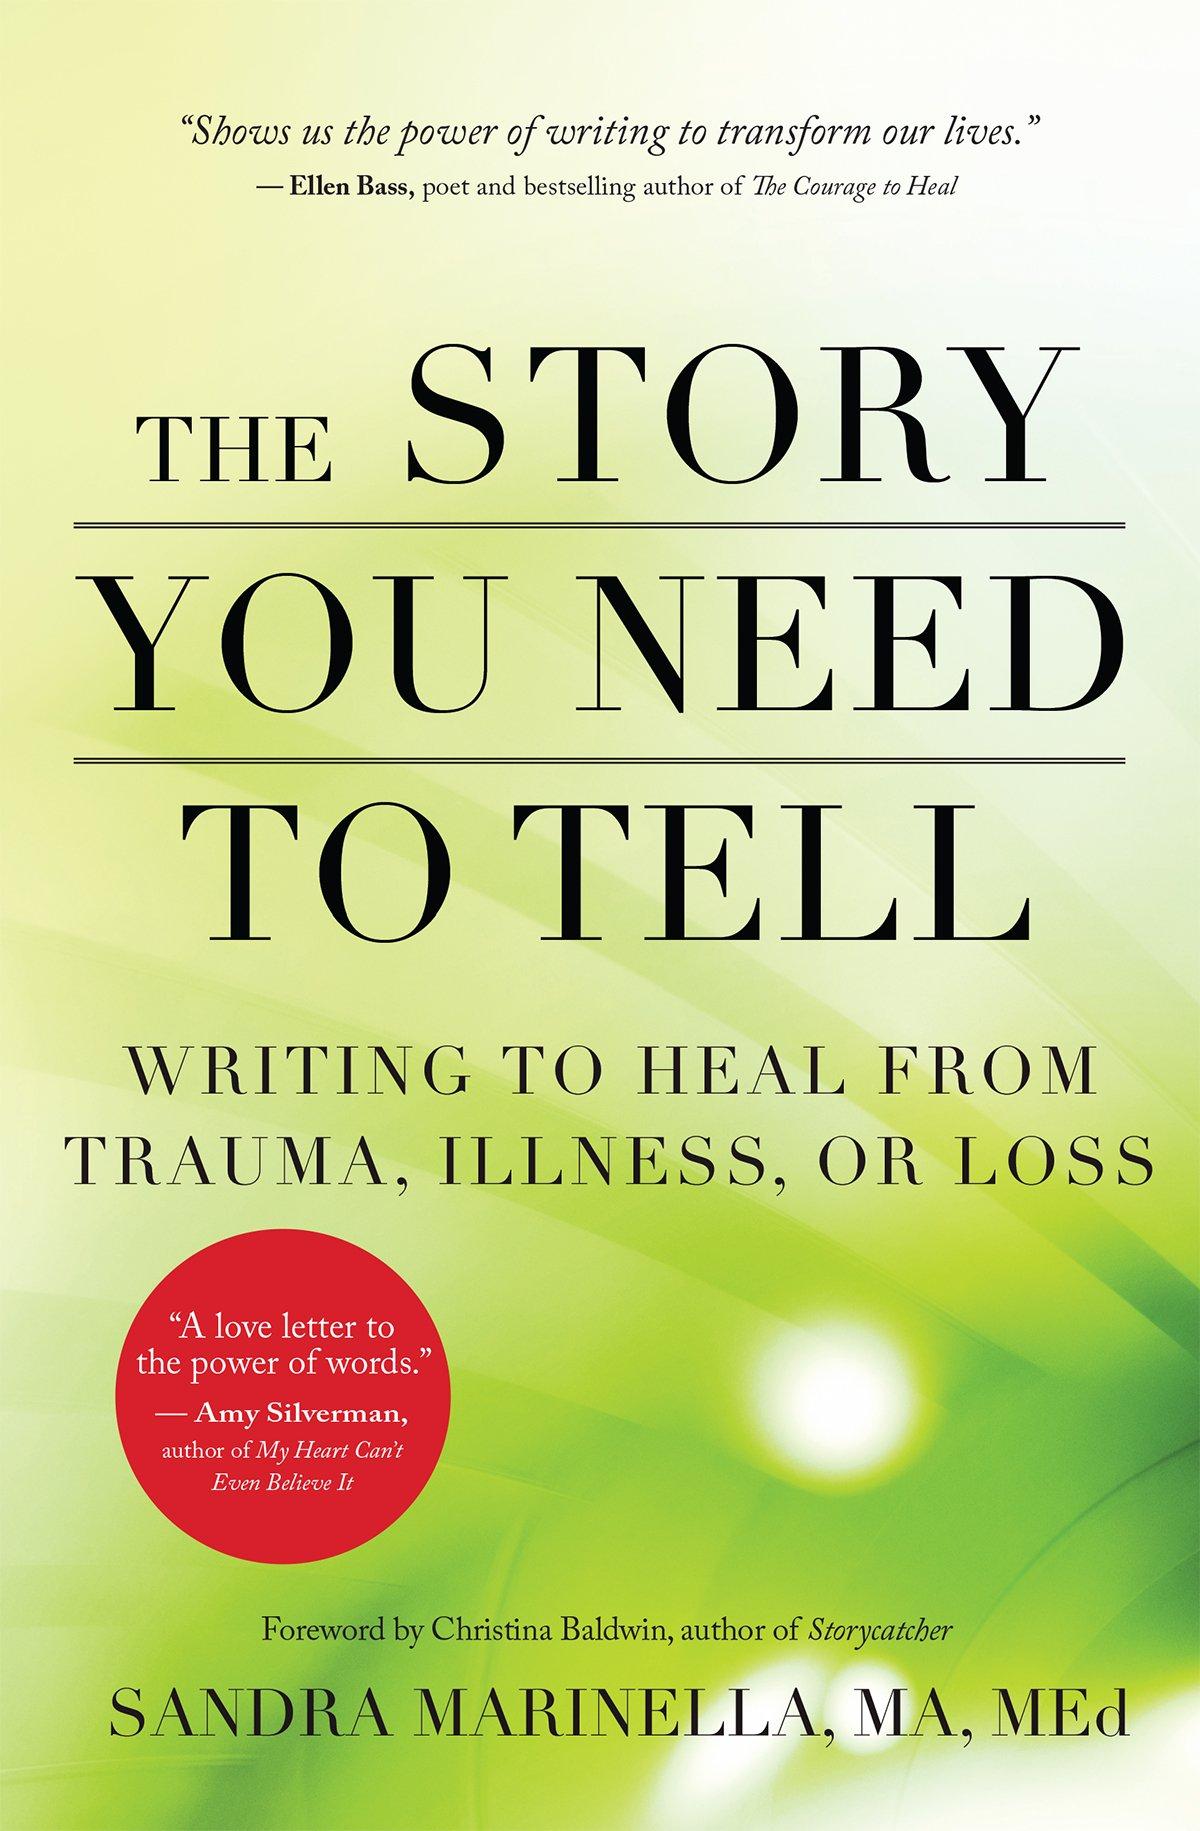 Designer deals club for hancock - The Story You Need To Tell Writing To Heal From Trauma Illness Or Loss Sandra Marinella Christina Baldwin 9781608684830 Amazon Com Books